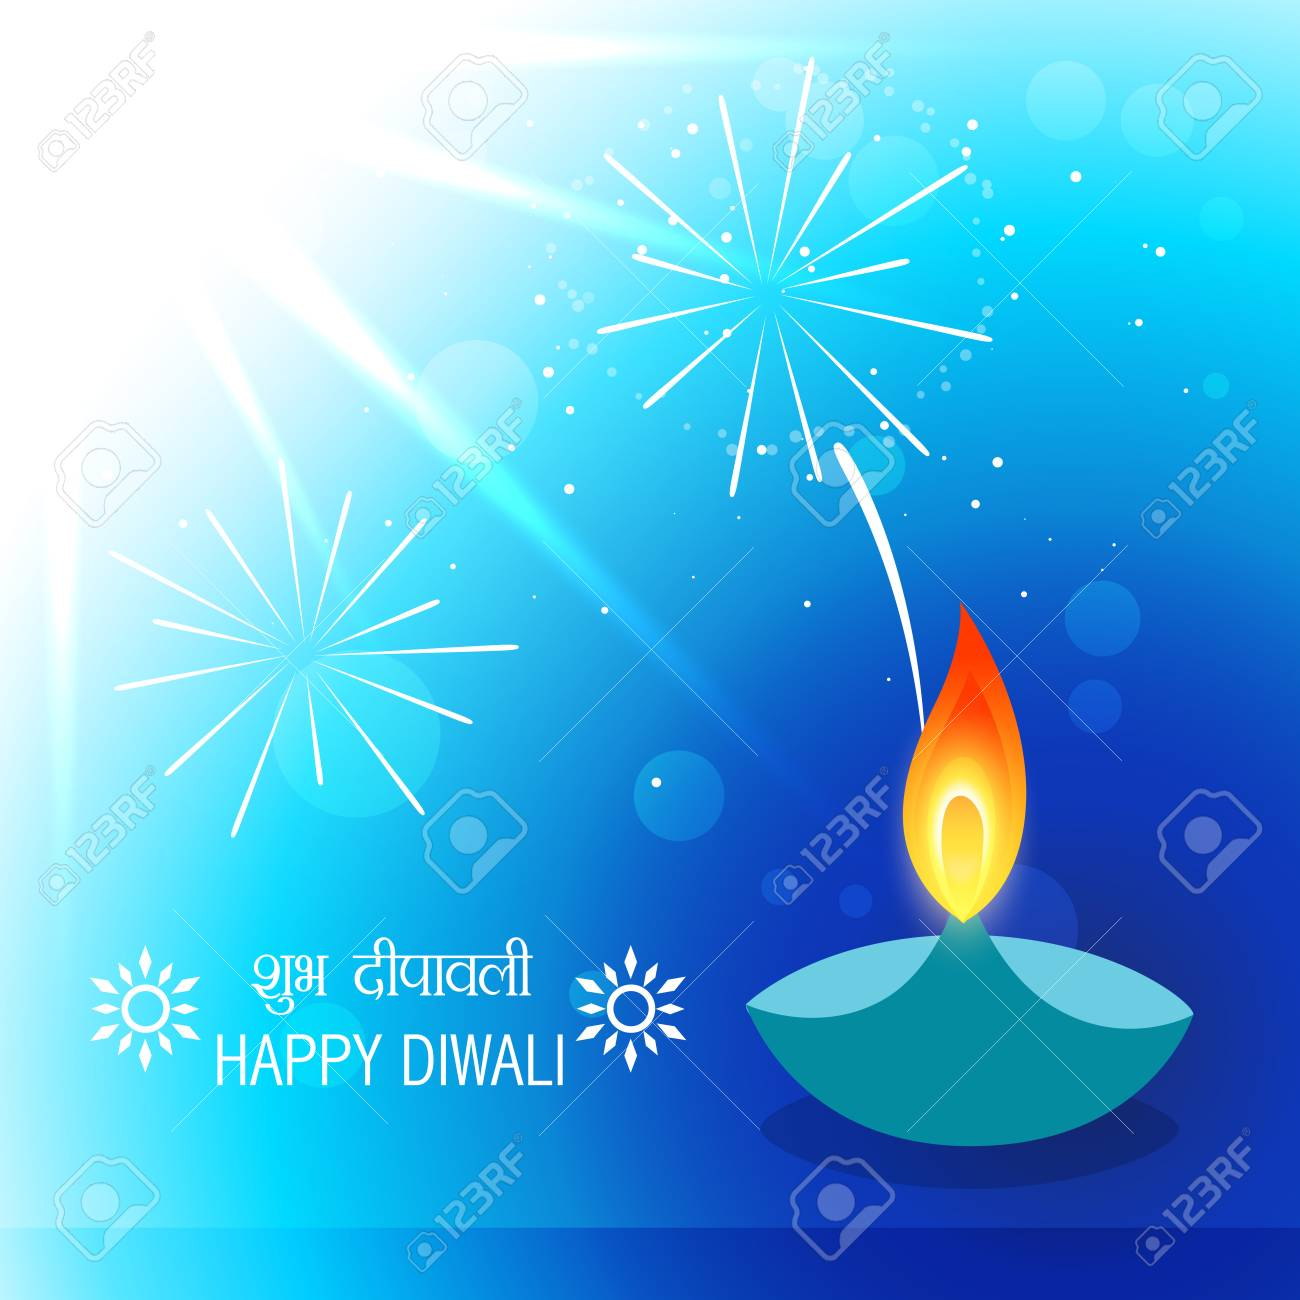 vector diwali greeting design background Stock Vector - 23064496